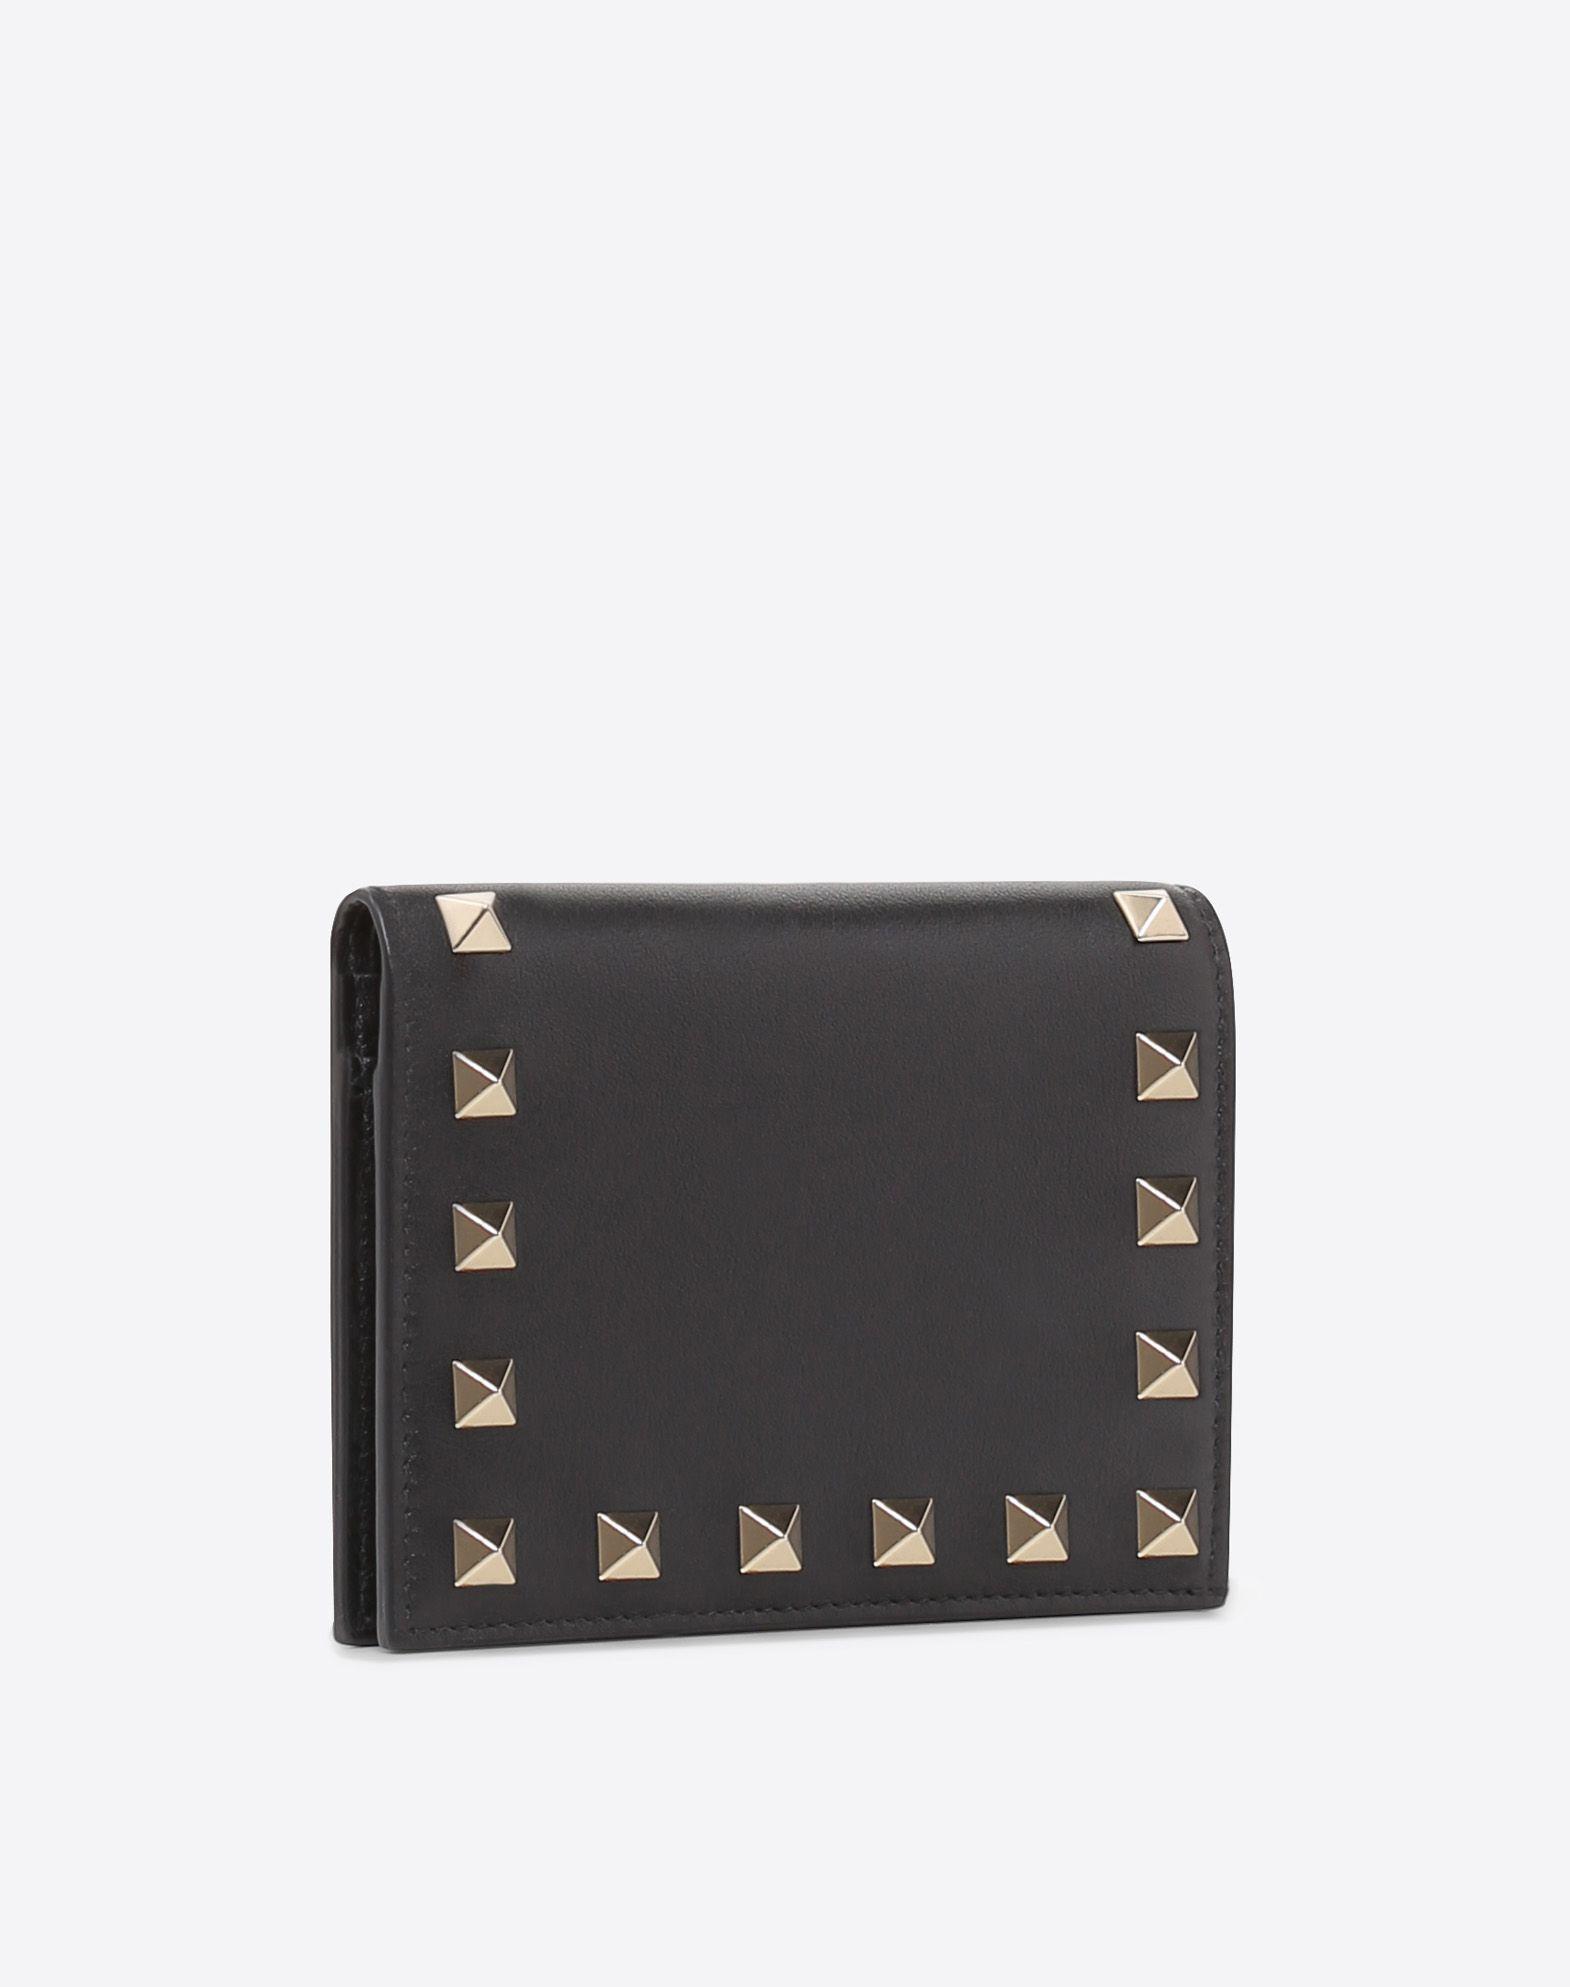 VALENTINO GARAVANI Rockstud Compact Wallet COMPACT WALLETS E r